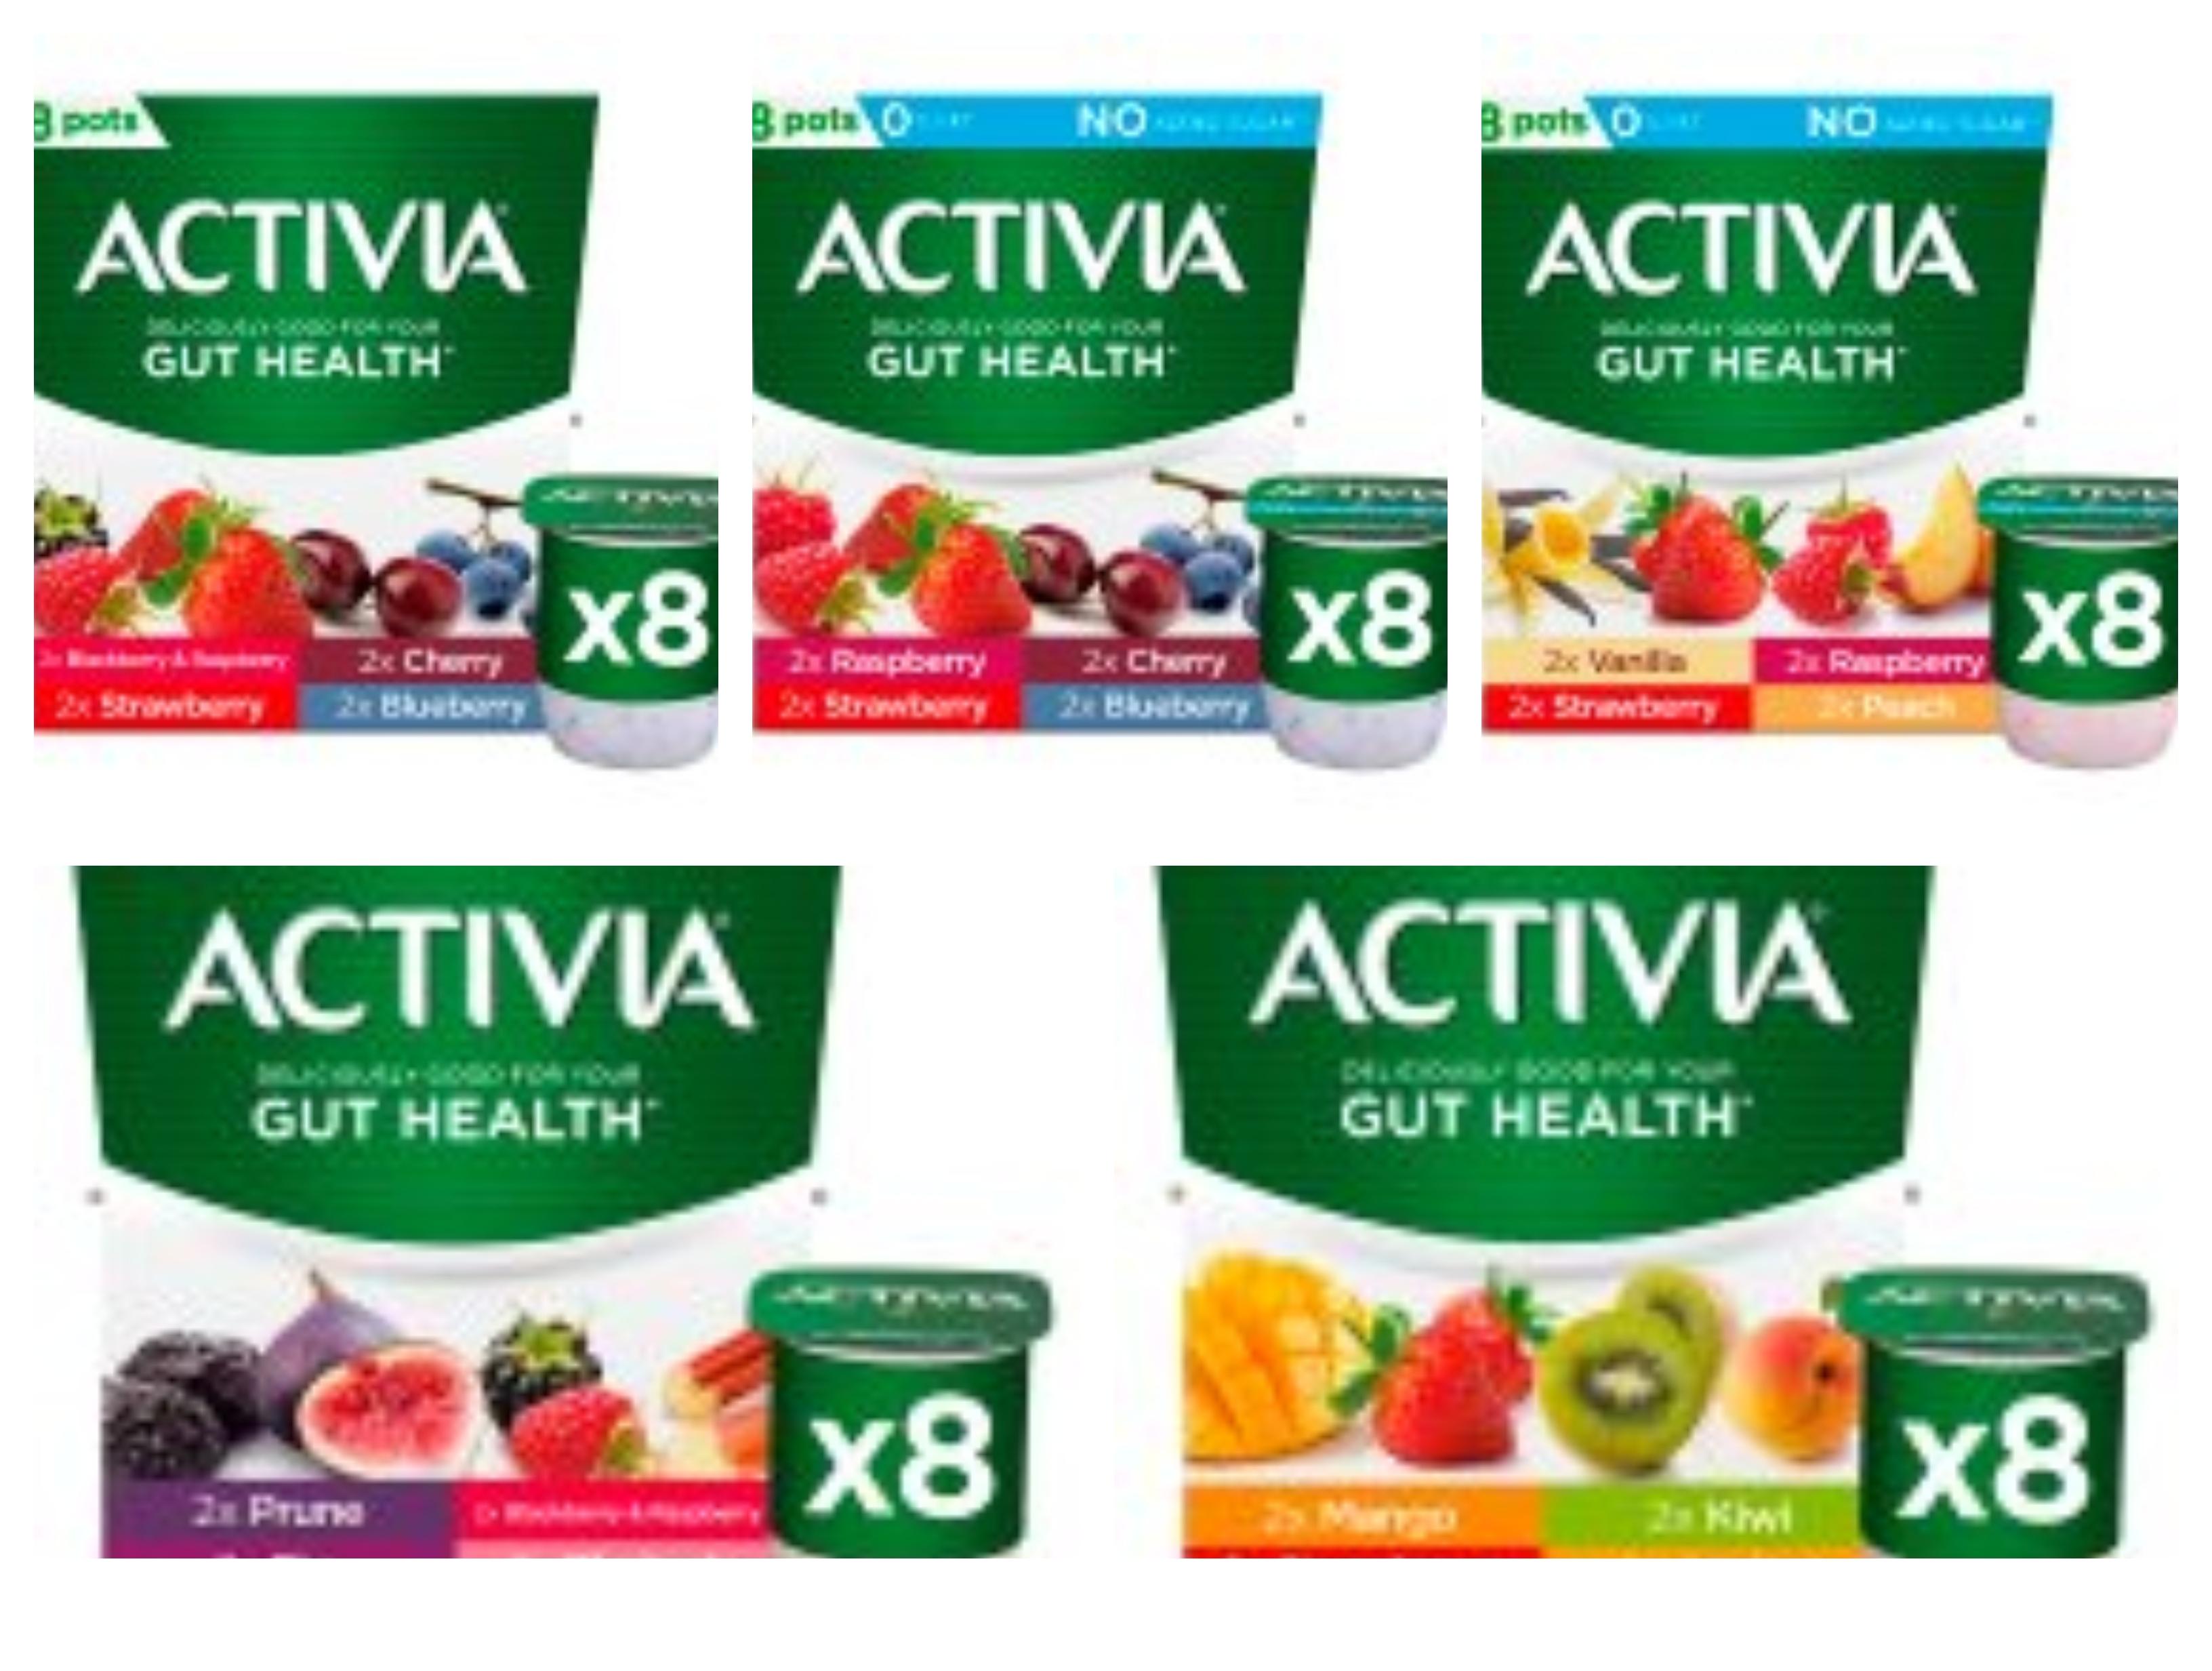 Activia Red Fruits Yogurt 8x120g ( 5 Varieties on offer ) - £2.00 @ Sainsbury's